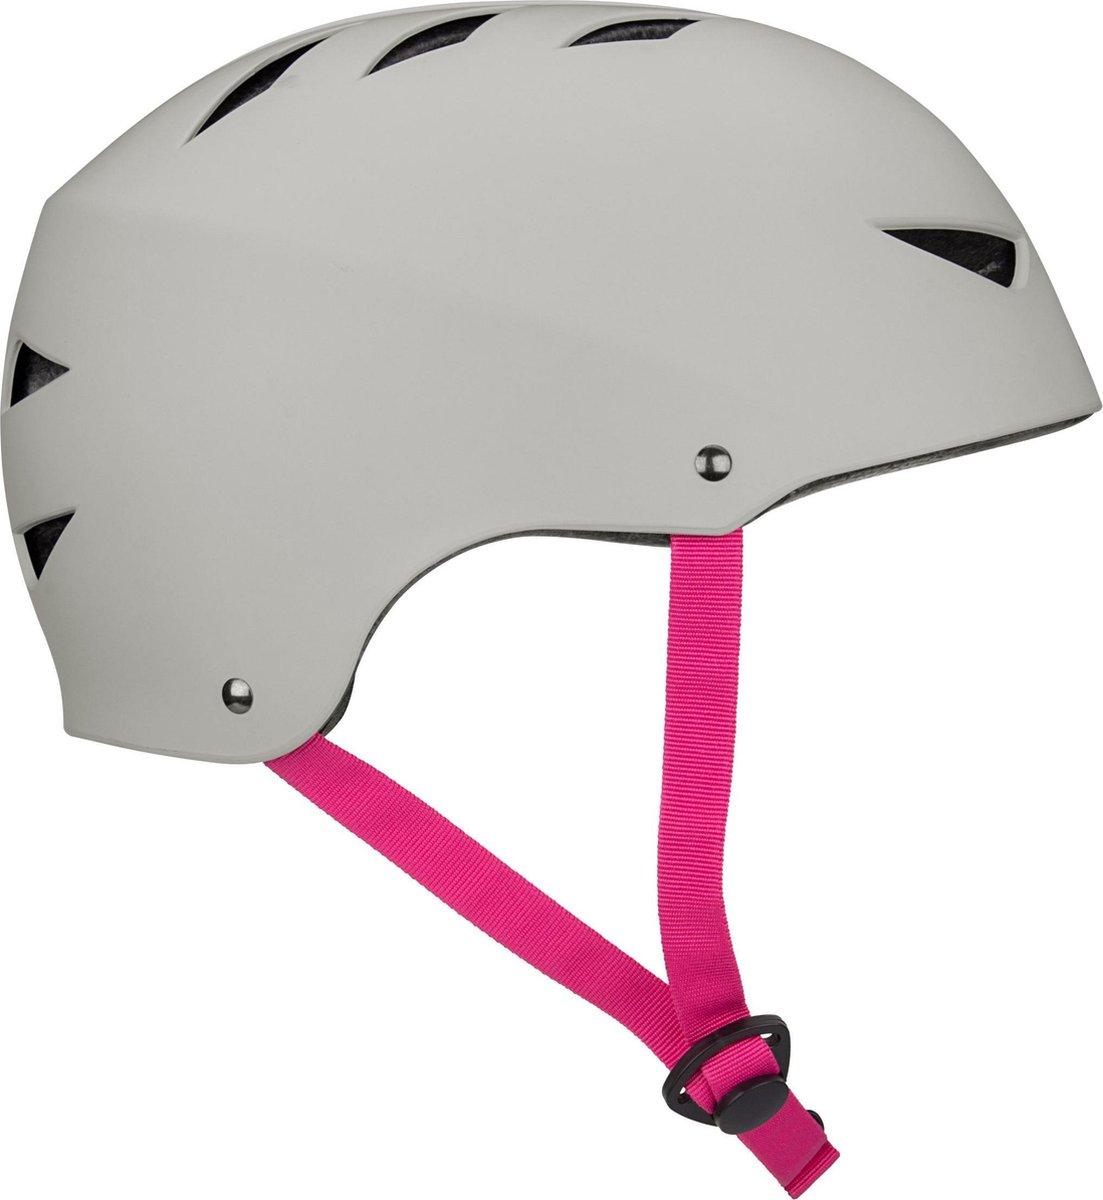 Nijdam Skate Helm - Pinky Swear - Grijs/Fuchsia - S